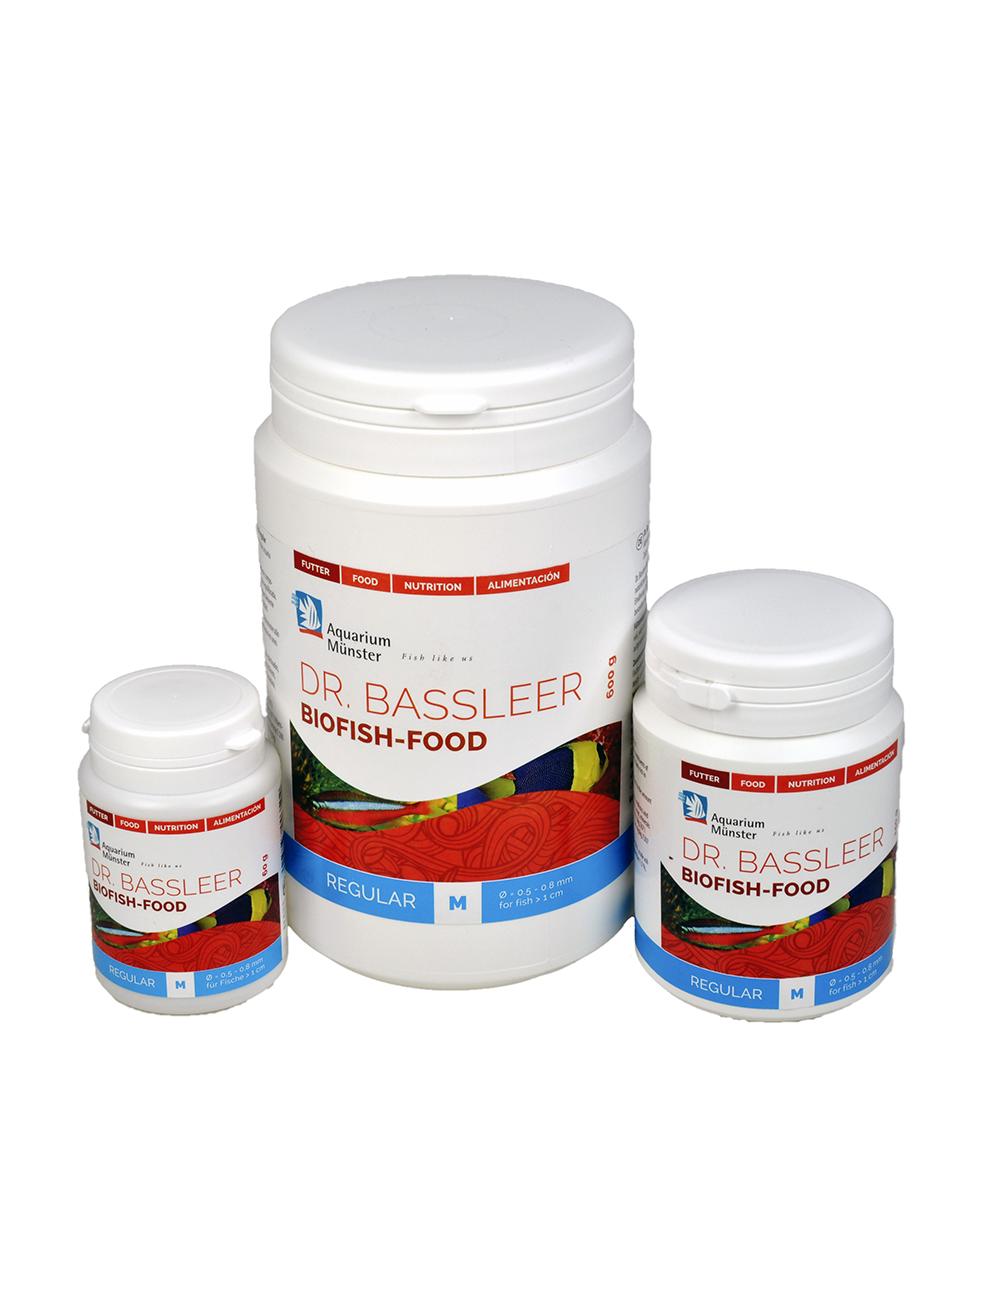 Dr. Bassleer BIOFISH FOOD Regular - 60gr - L